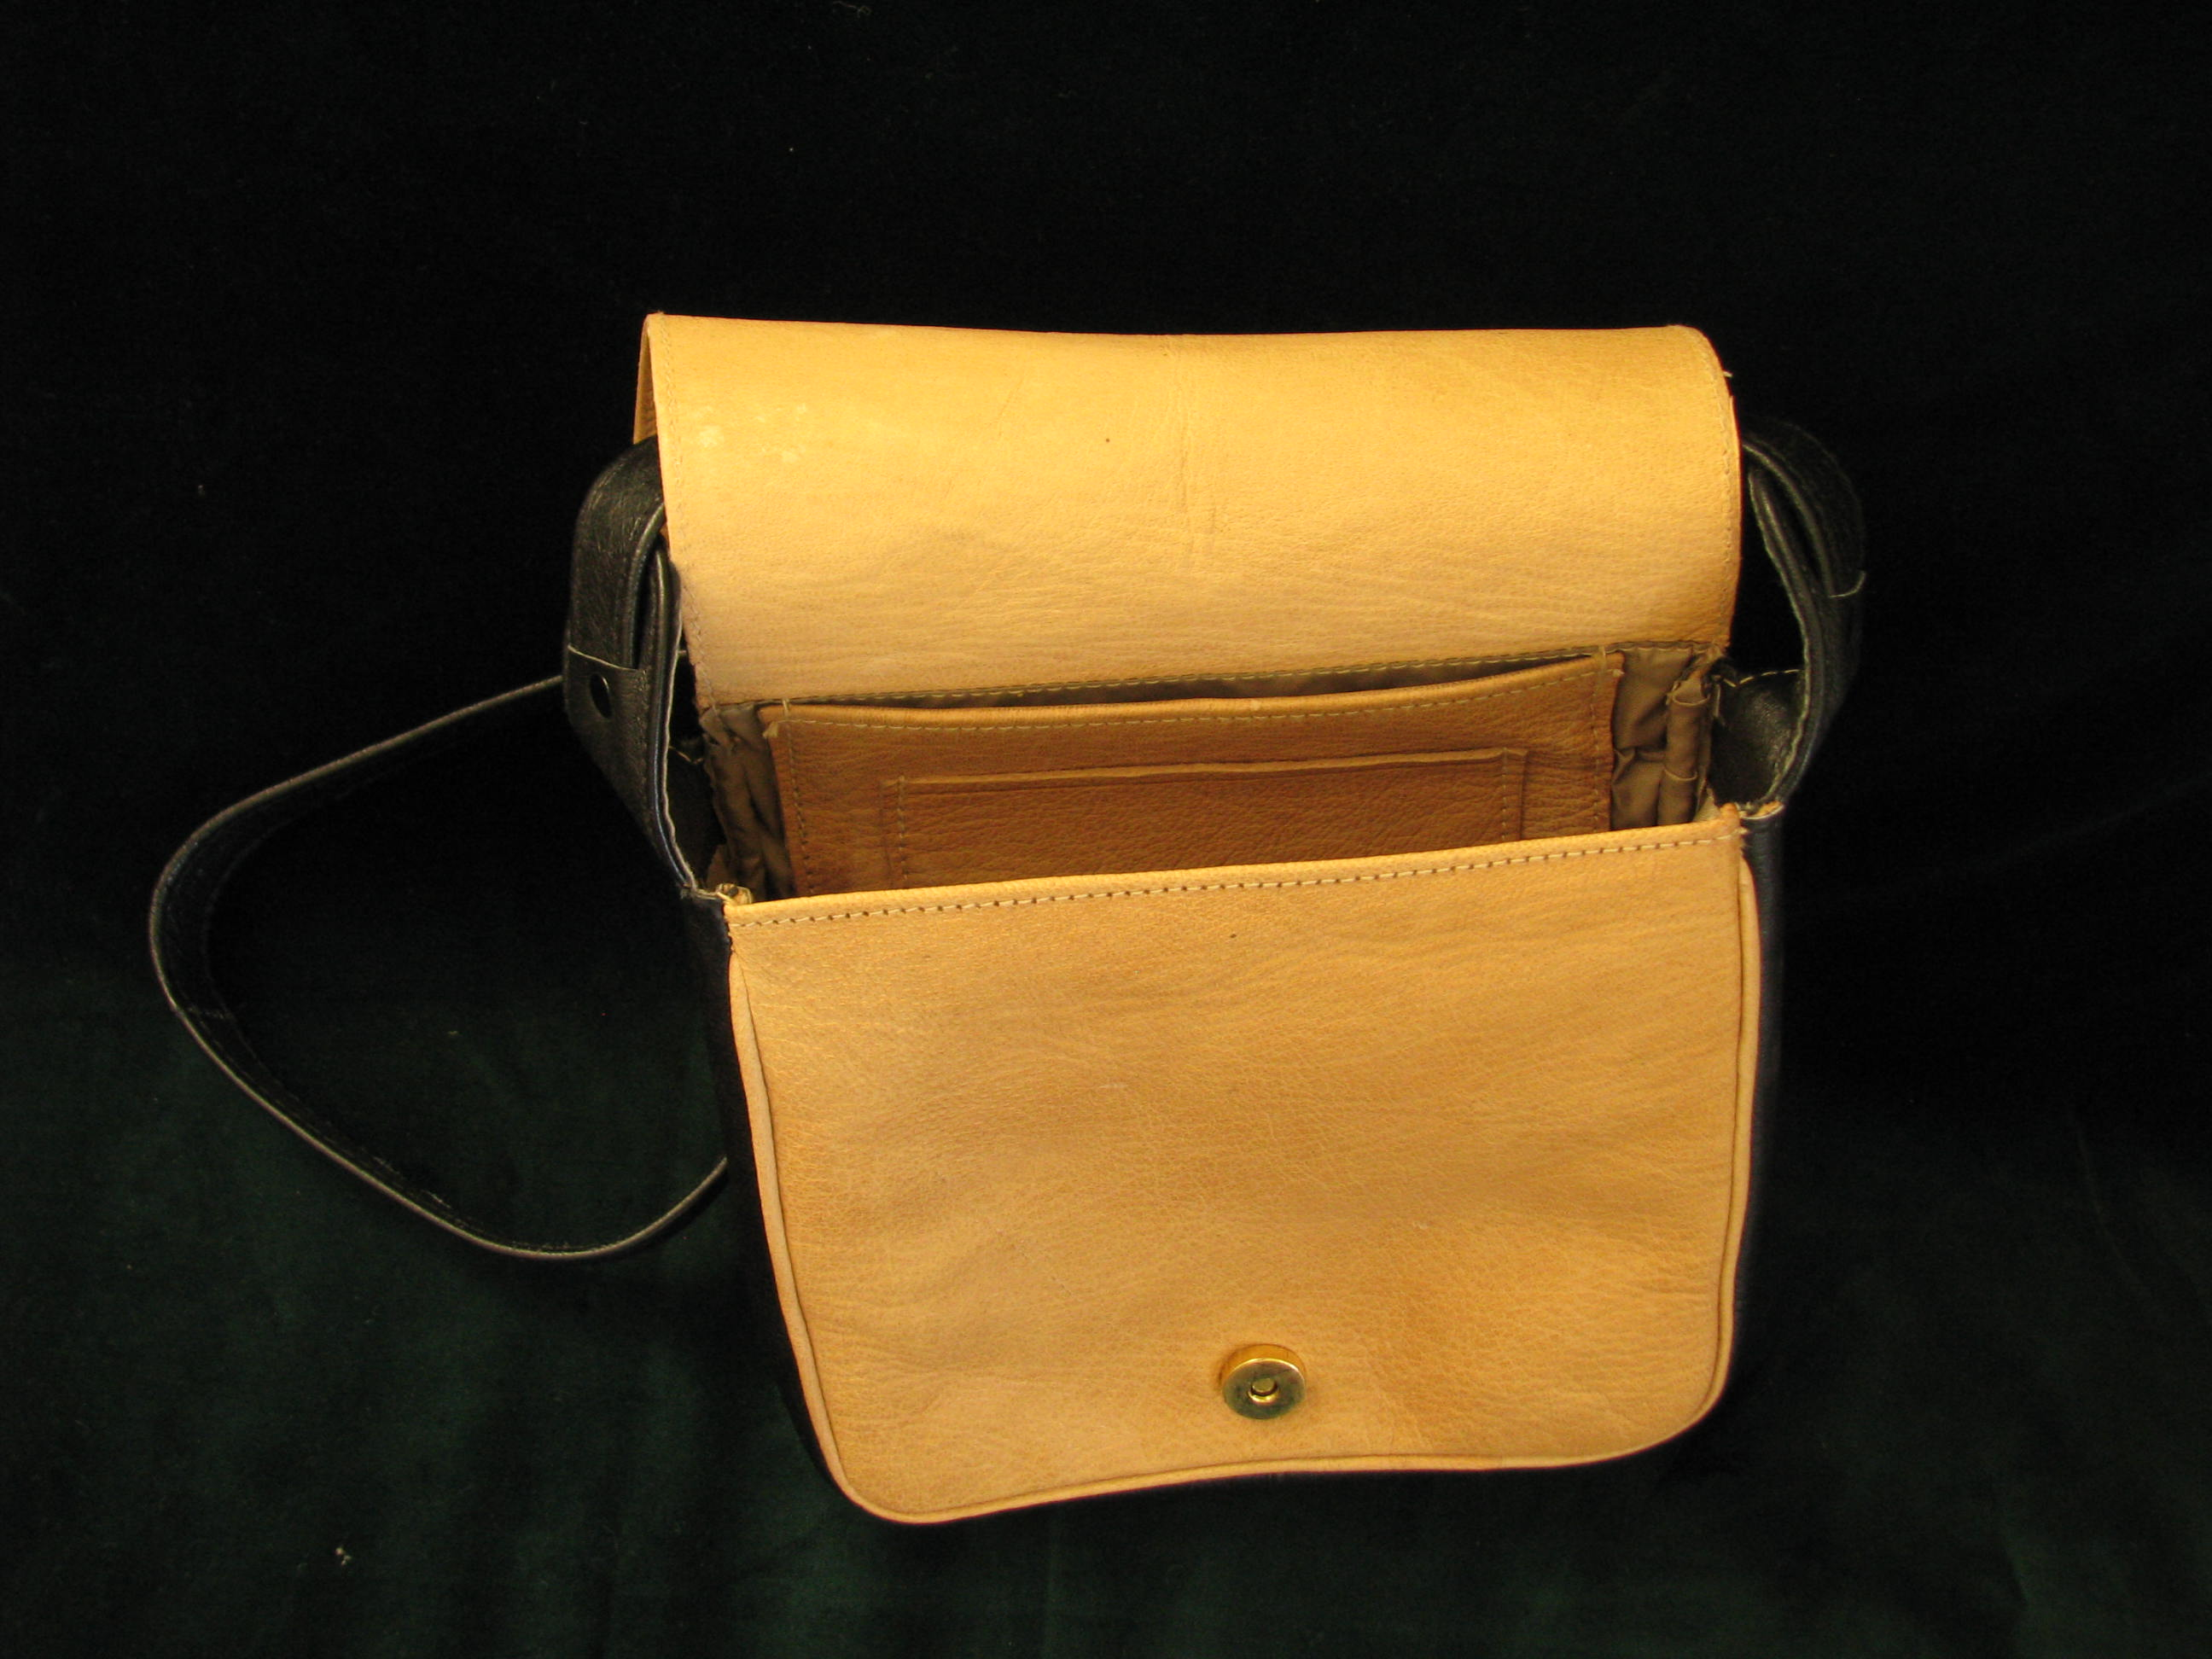 Gundara - Nigora - Echtleder-Handtasche - Schultertasche - offen